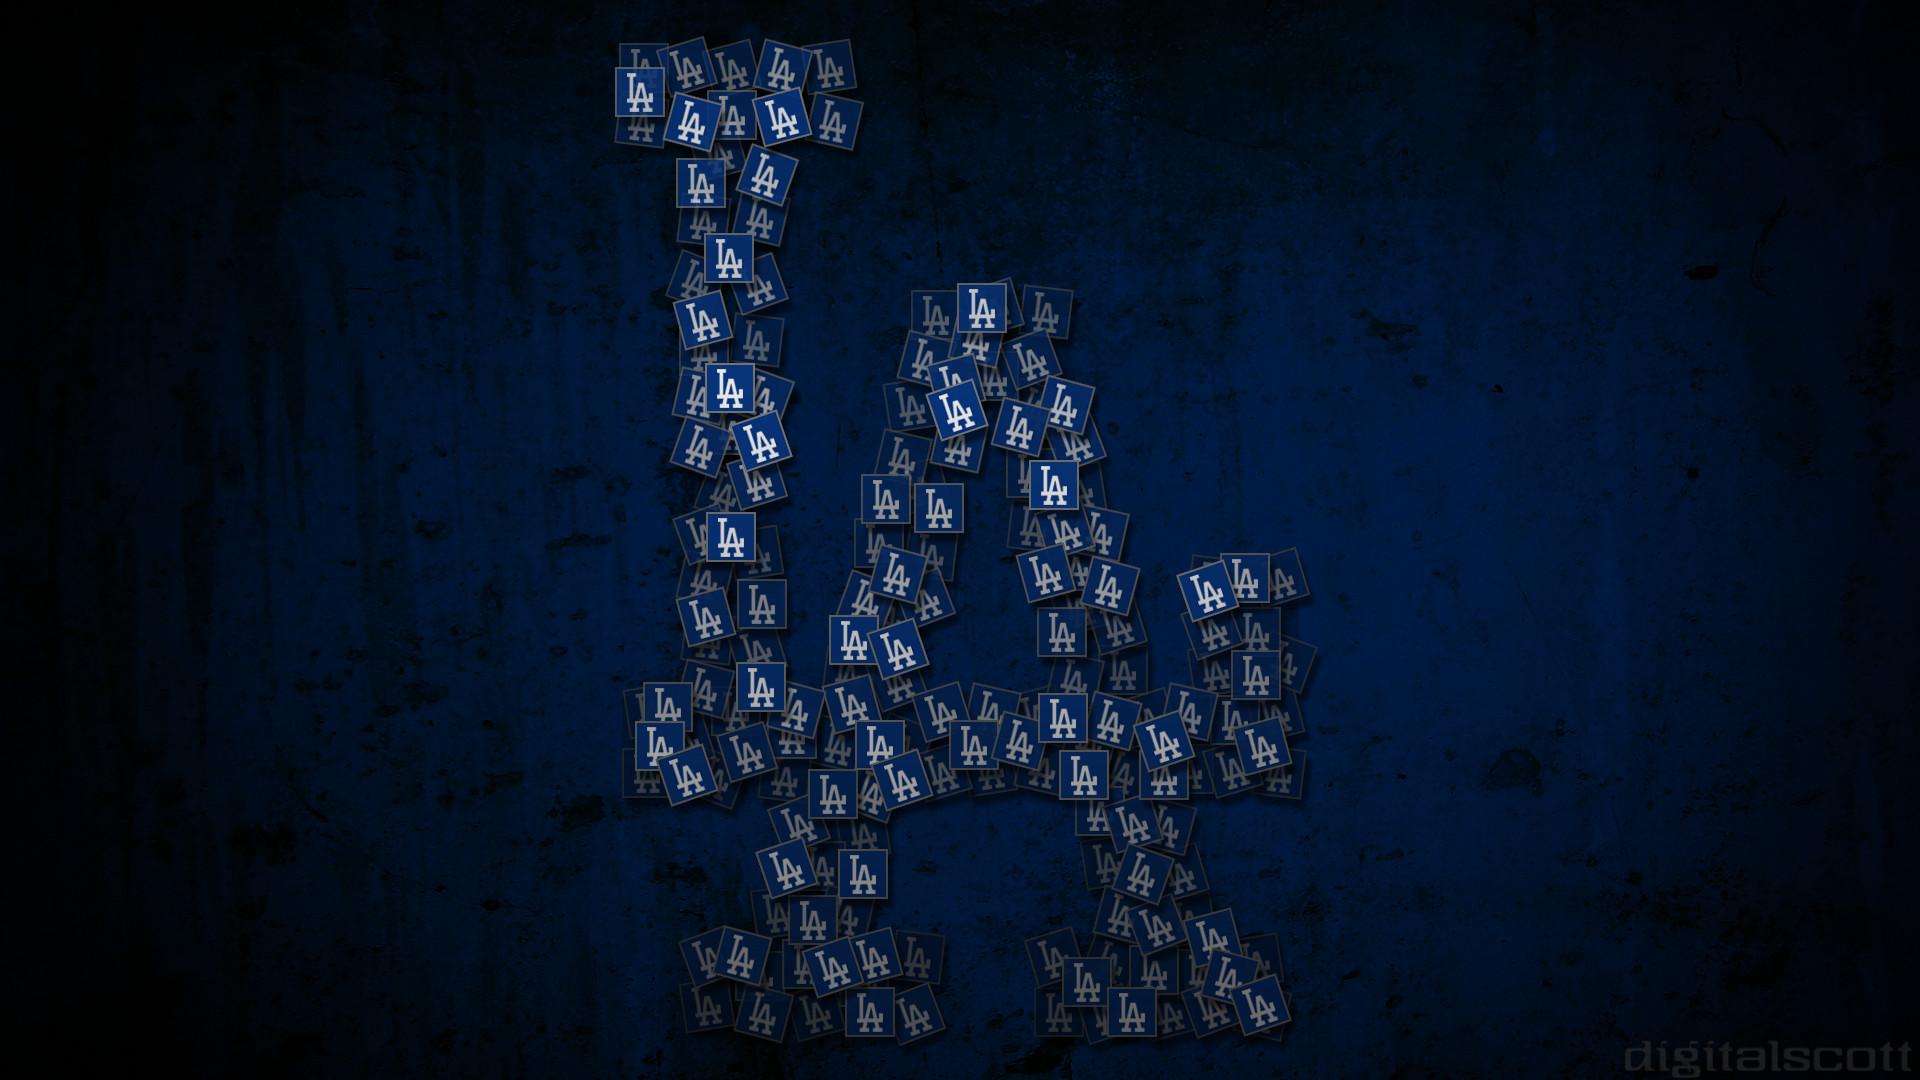 Los Angeles Dodgers Baseball Wallpapers Wallpapertag